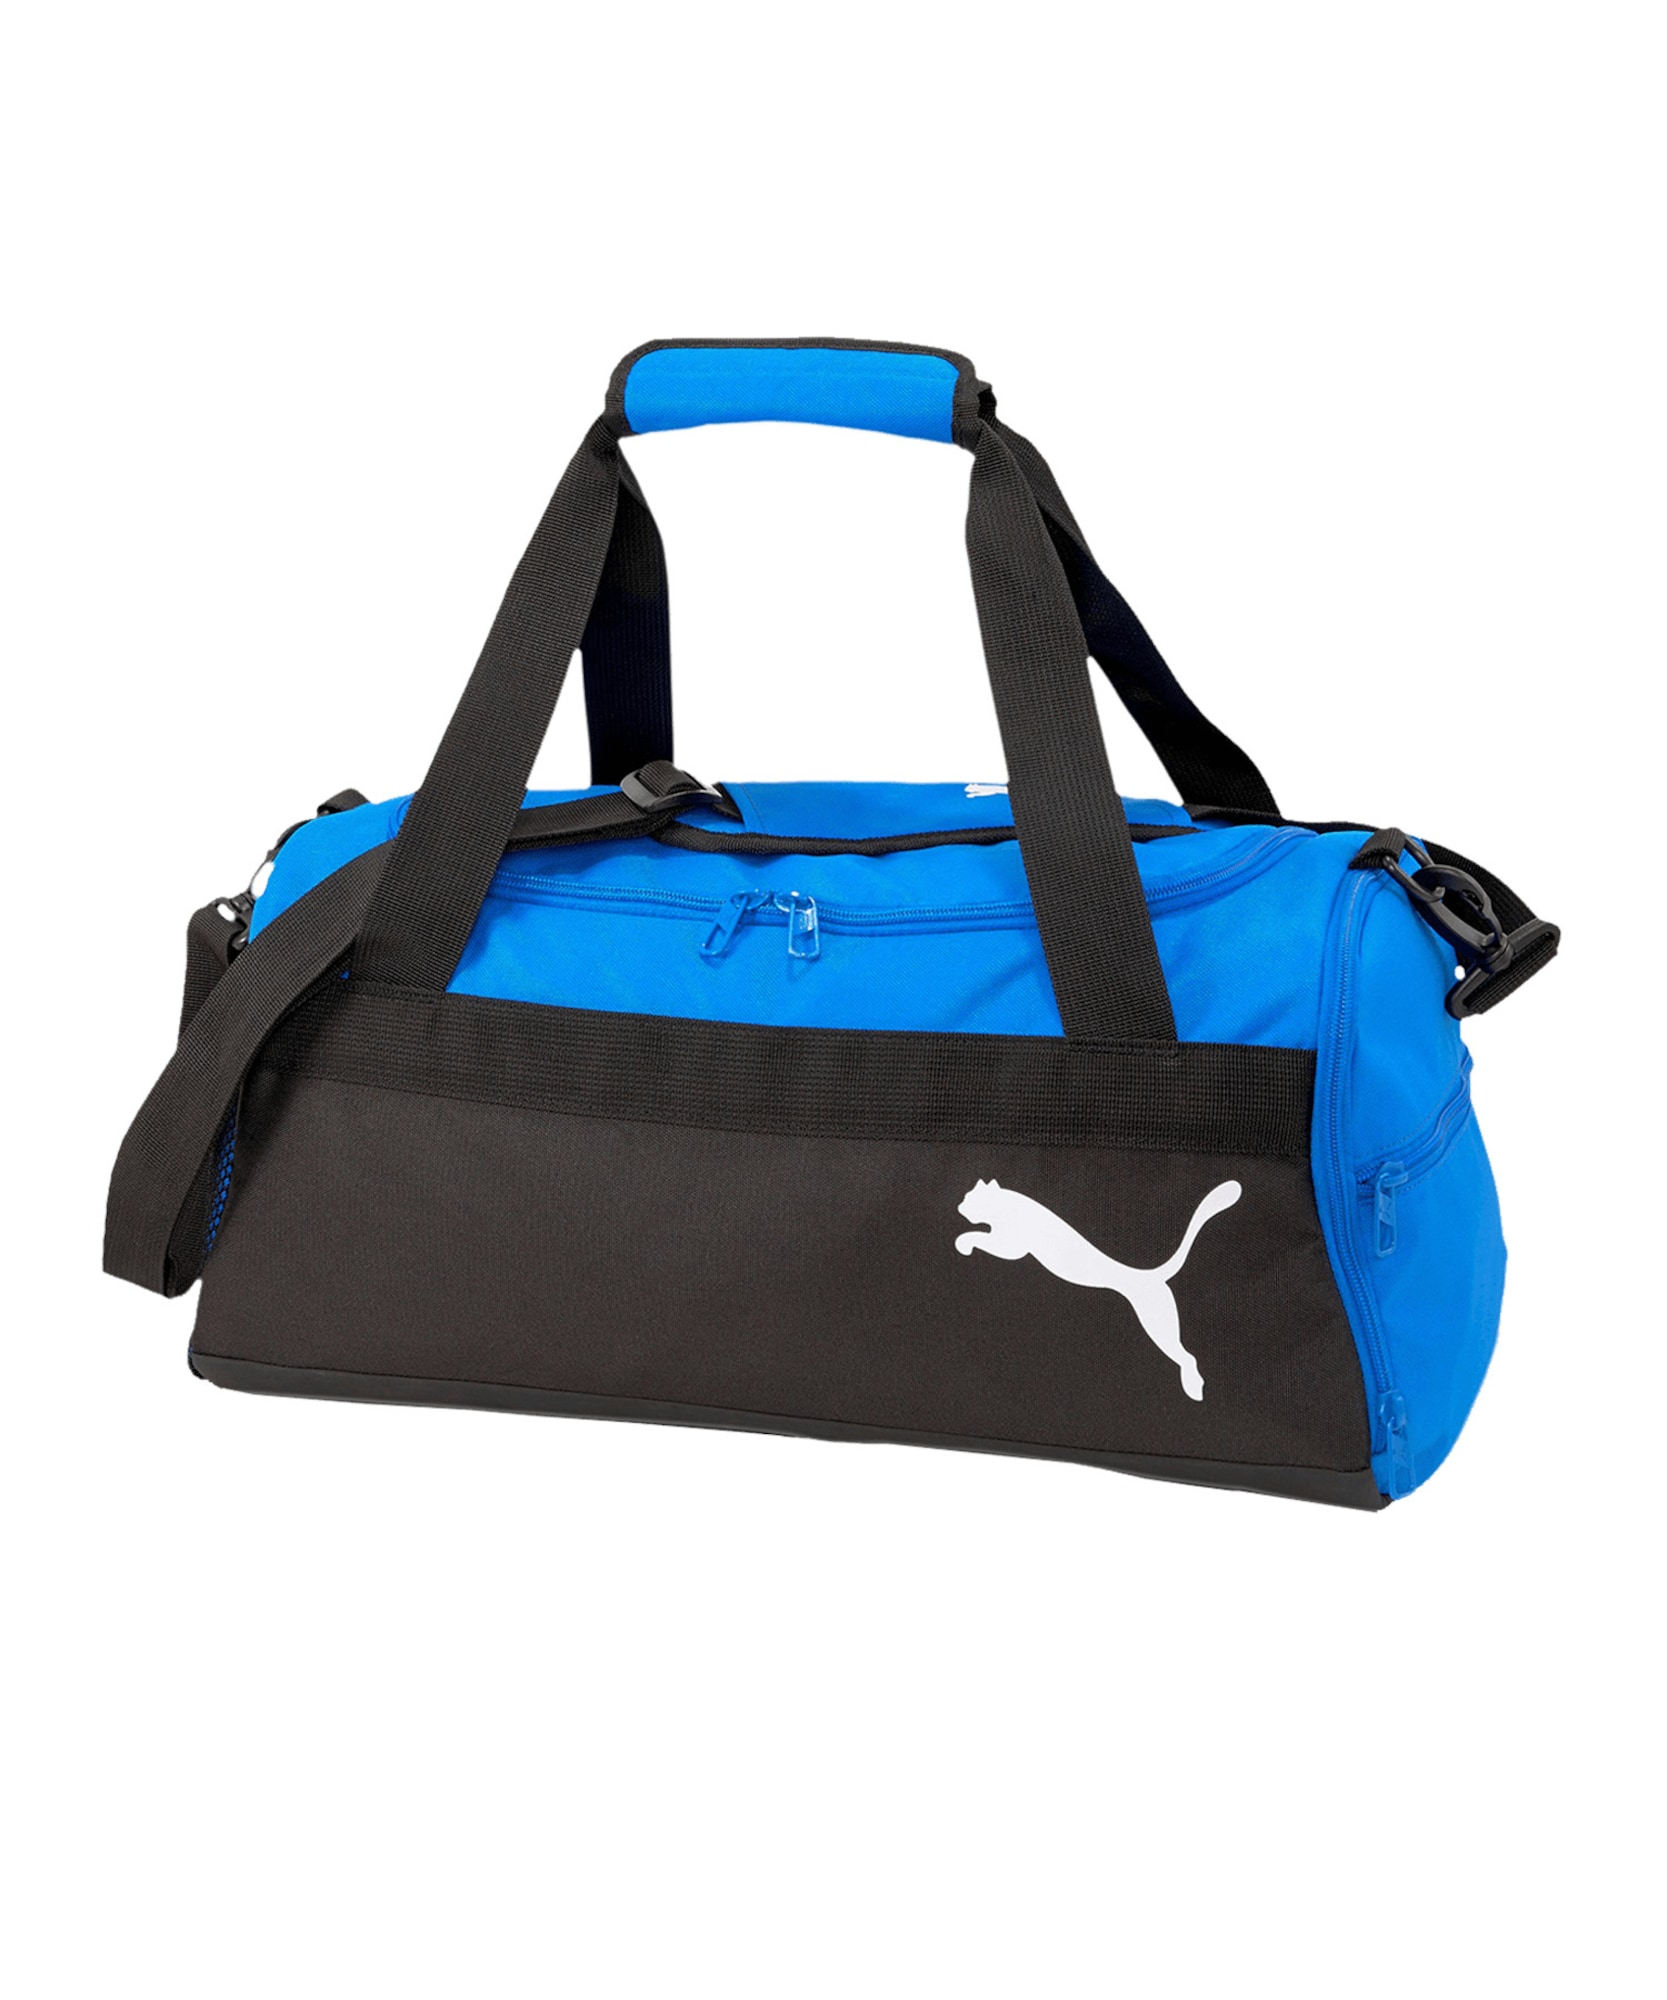 "PUMA Sportinis krepšys juoda / sodri mėlyna (""karališka"")"